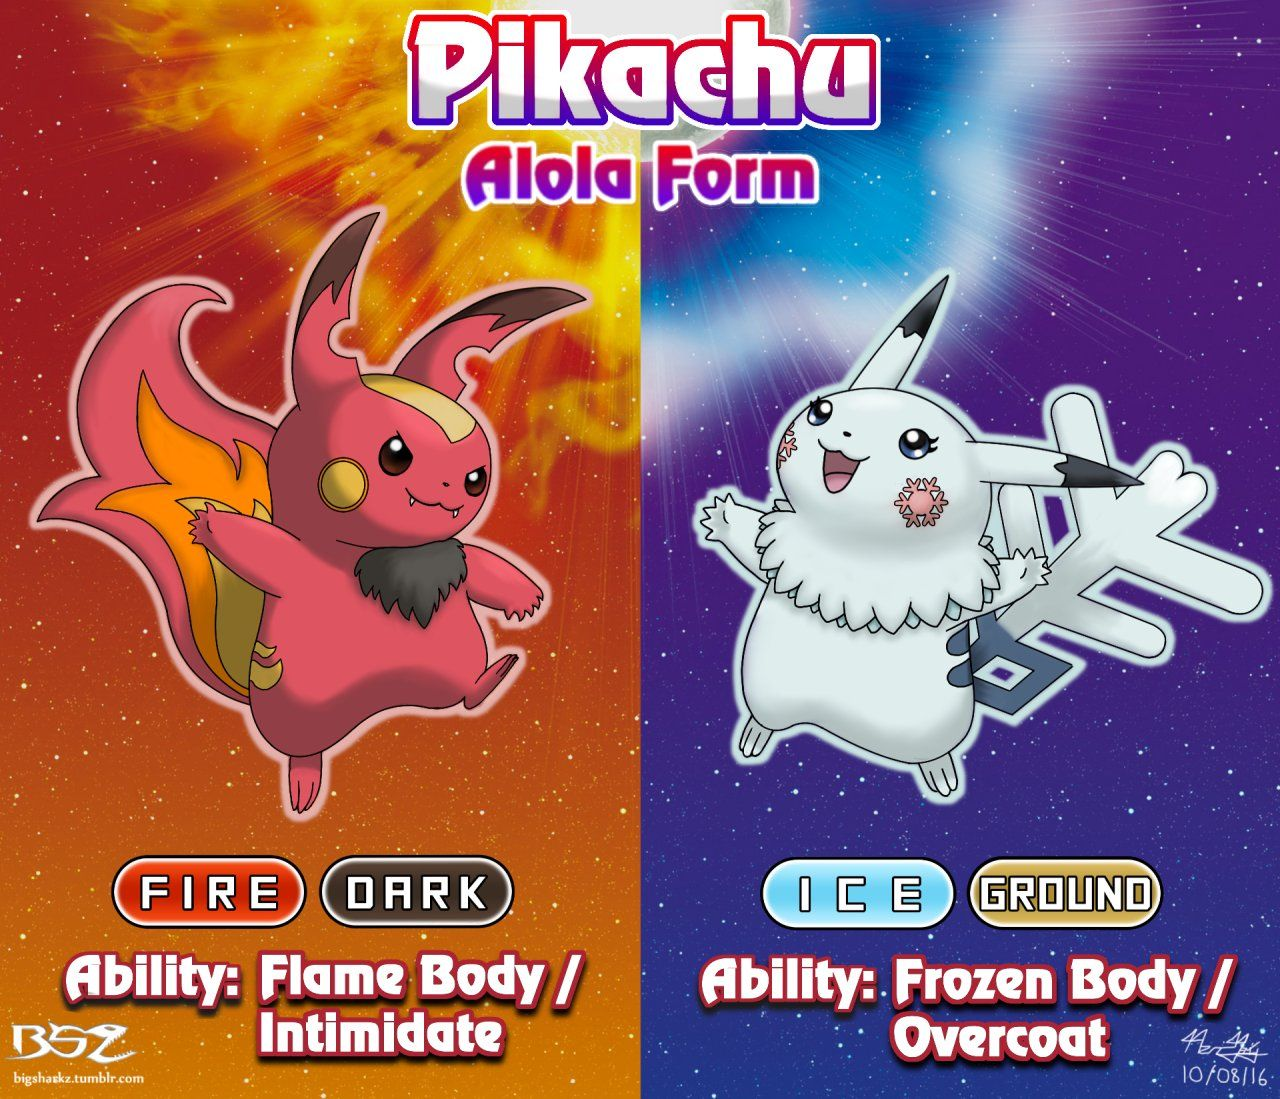 Aloha Form Vaporeon 20 Pokemon Alola Forms We Wish Were Real